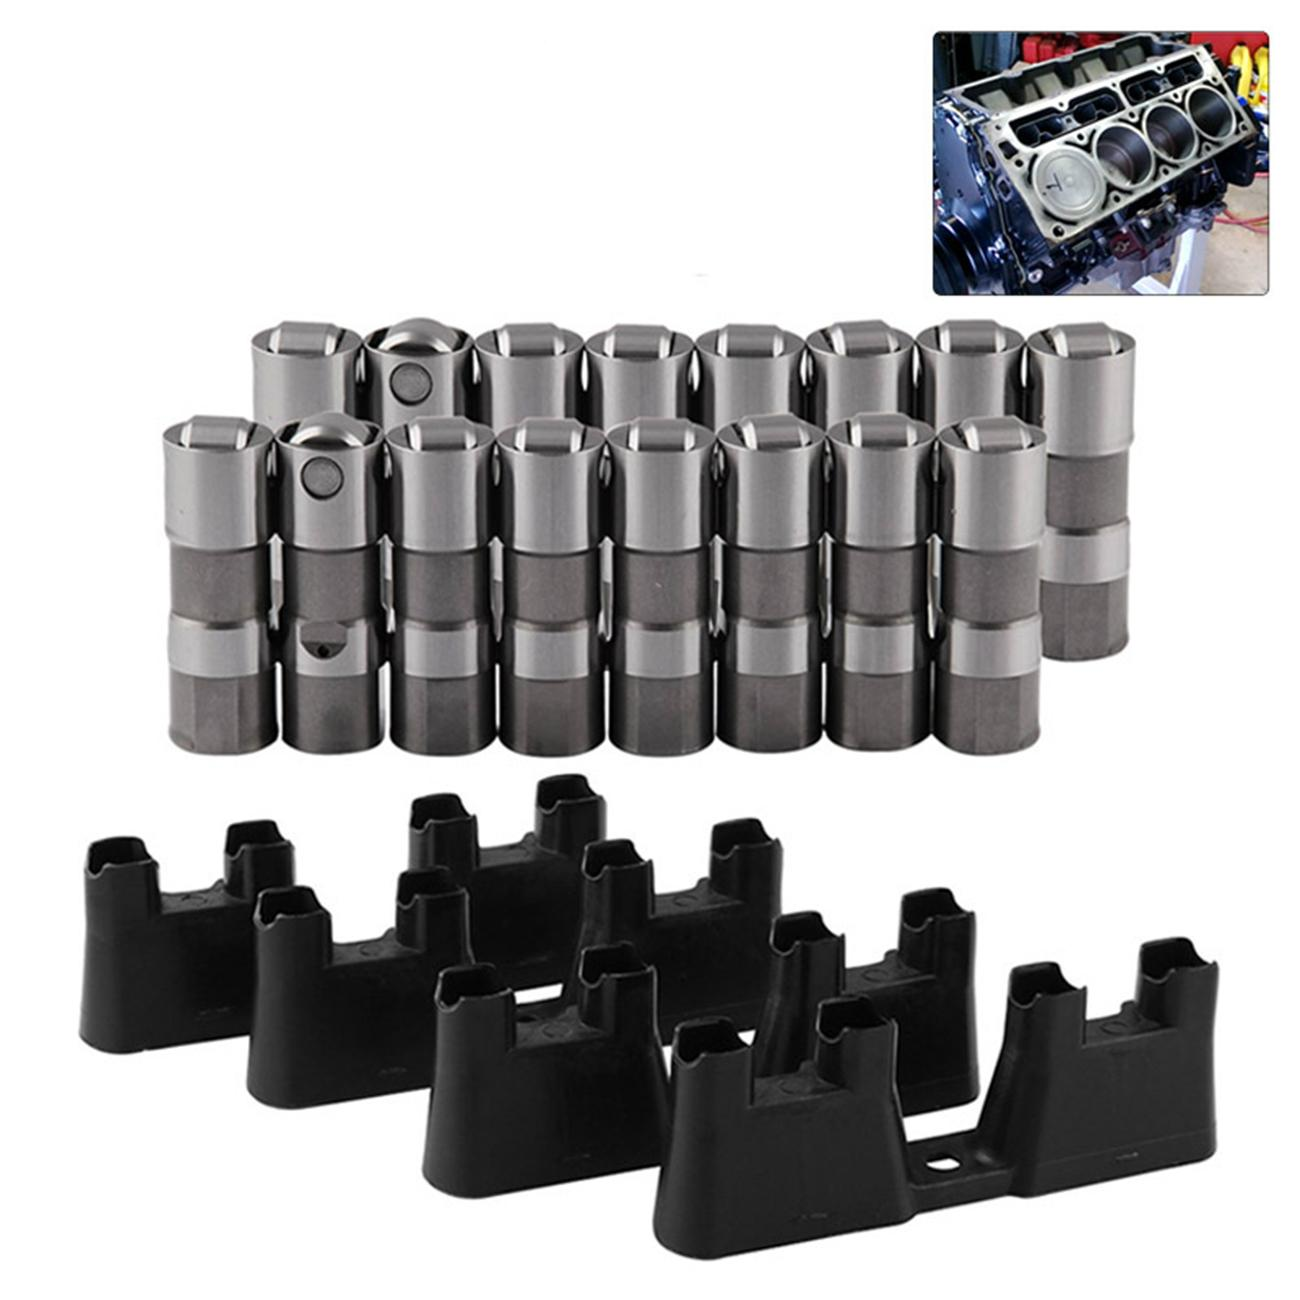 LS7 LS2 Lifters Full 16 PCS Performance Hydraulic Rollers Fit GM 12499225 HL124